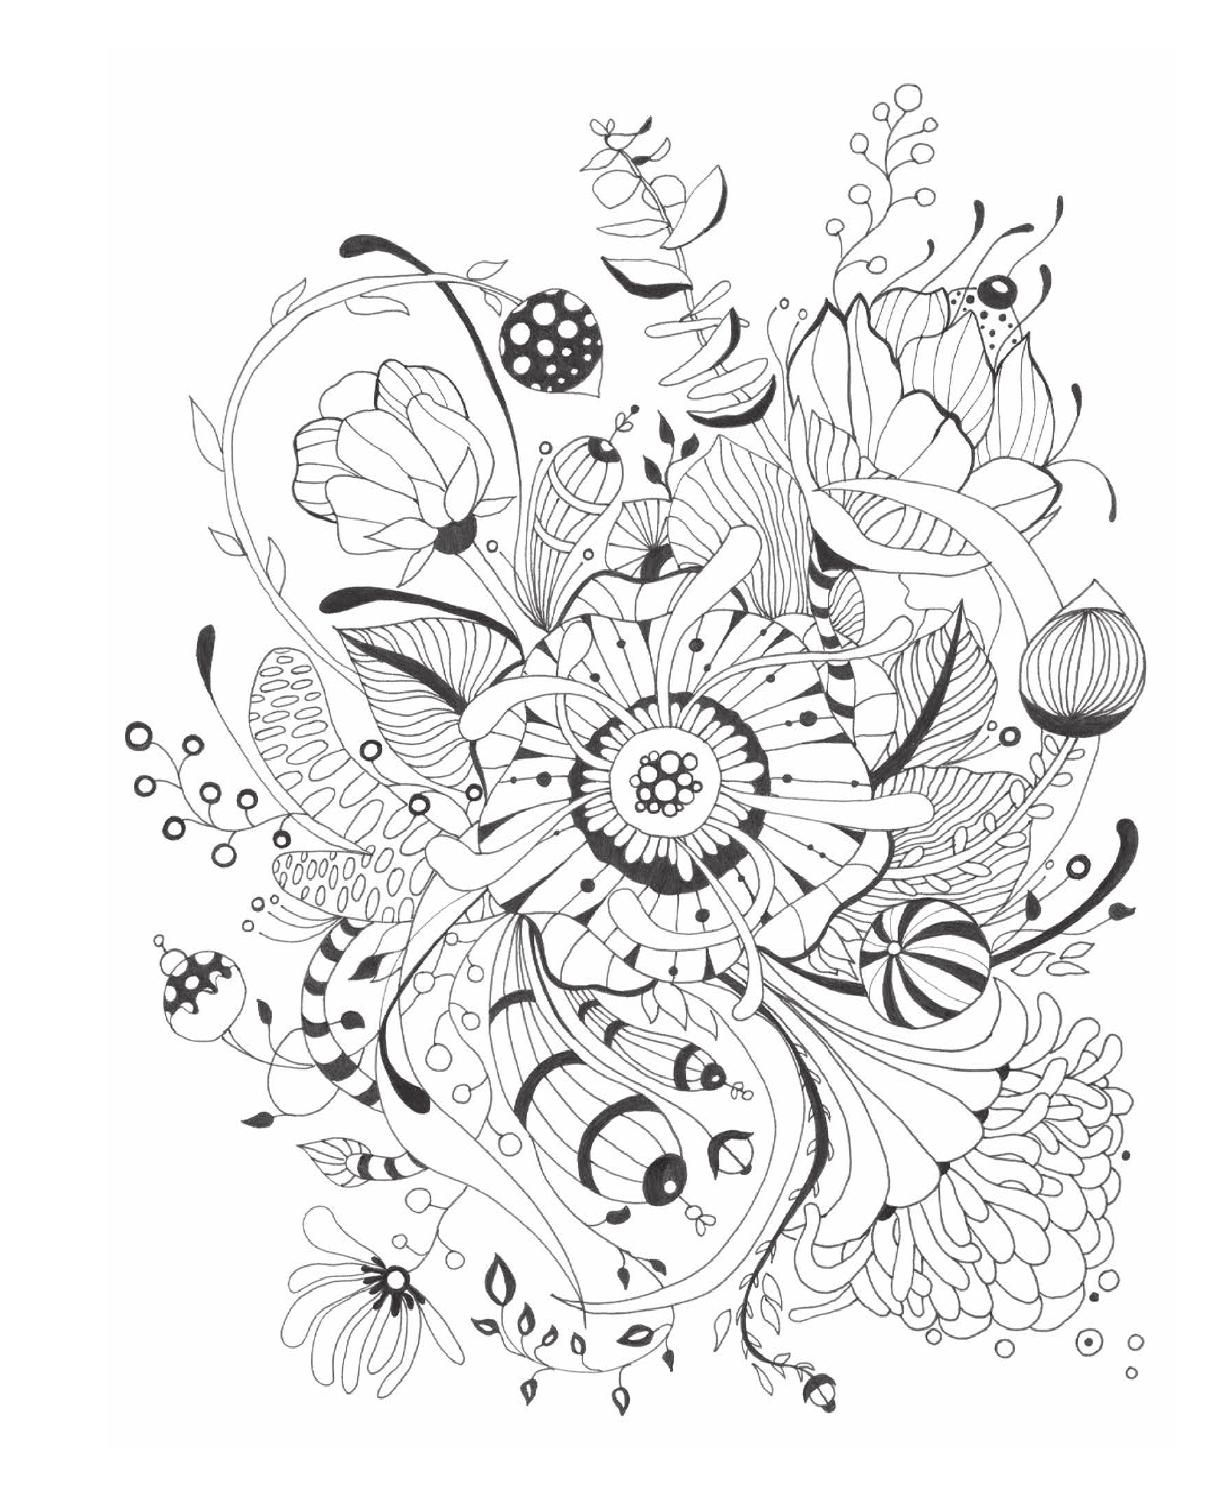 Botanical art coloring book - Botanical Wonderland Adult Coloringcoloring Booksfloral Paintings Doodleswonderland